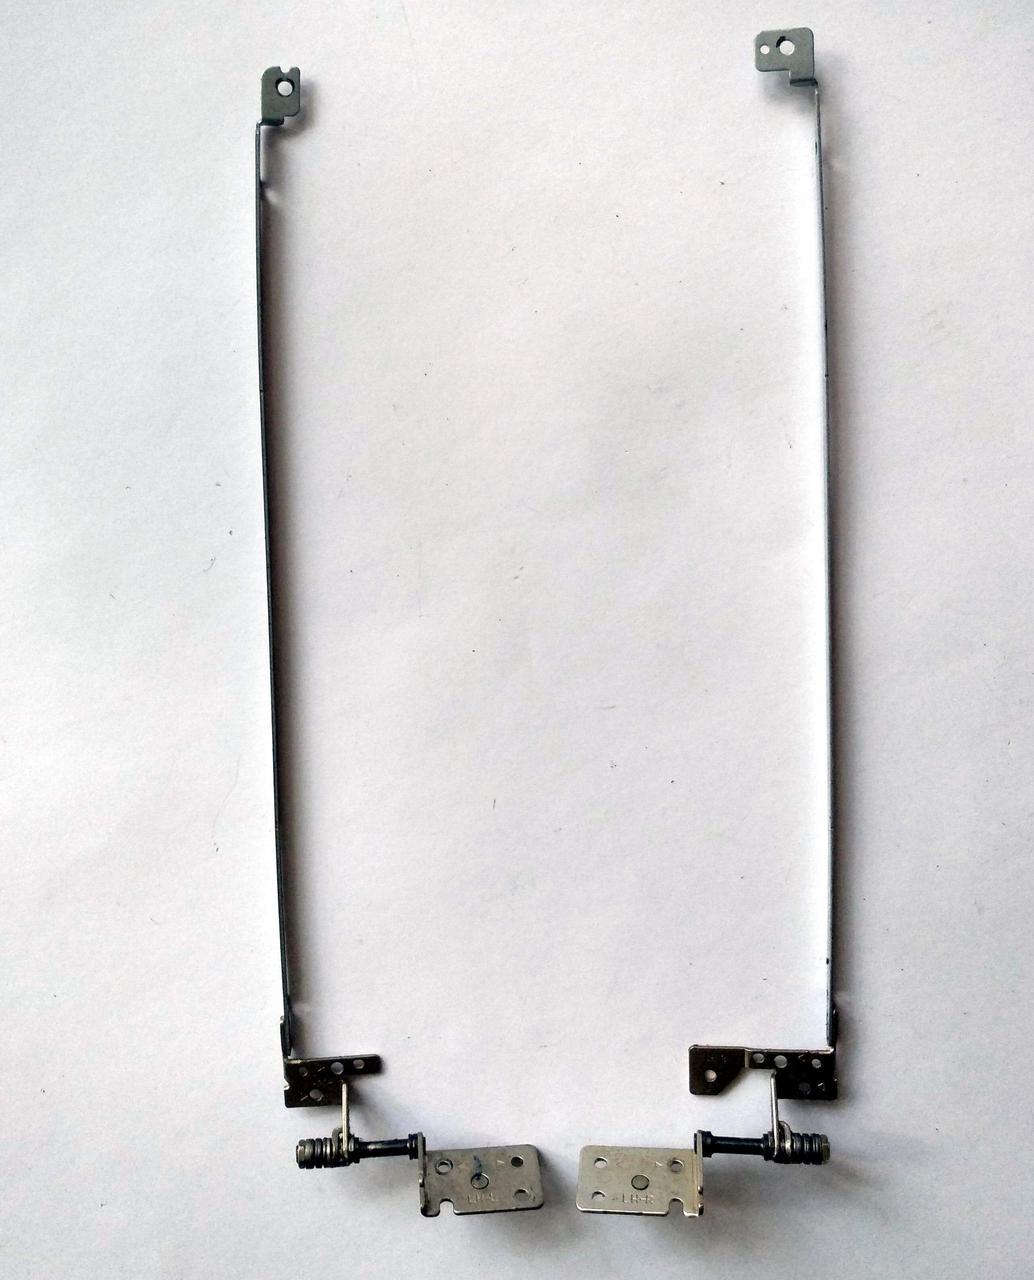 442 Петли Lenovo B575 V570 B570 V575 - 33.4IH16.XXX 33.4IH17.XXX, 110915LA57A01 110919LA57A01